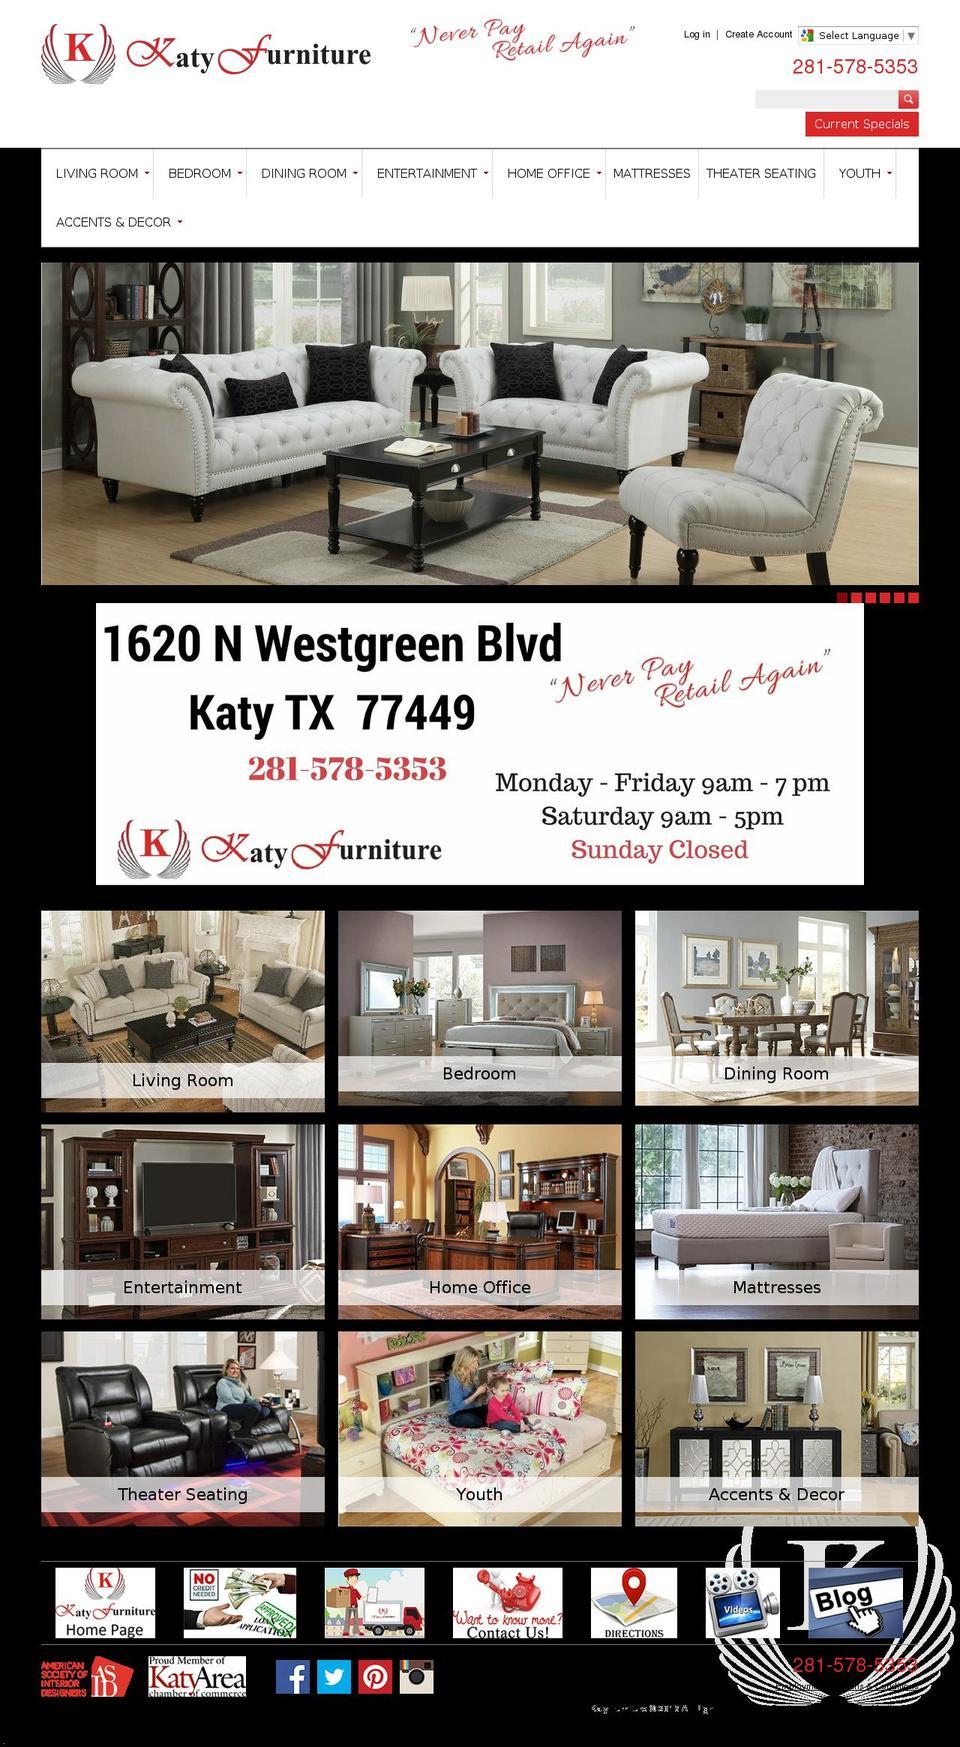 1 Websites Use The Katy Furniture   Megatronic Theme Shopify Theme.  Katyfurniture.com